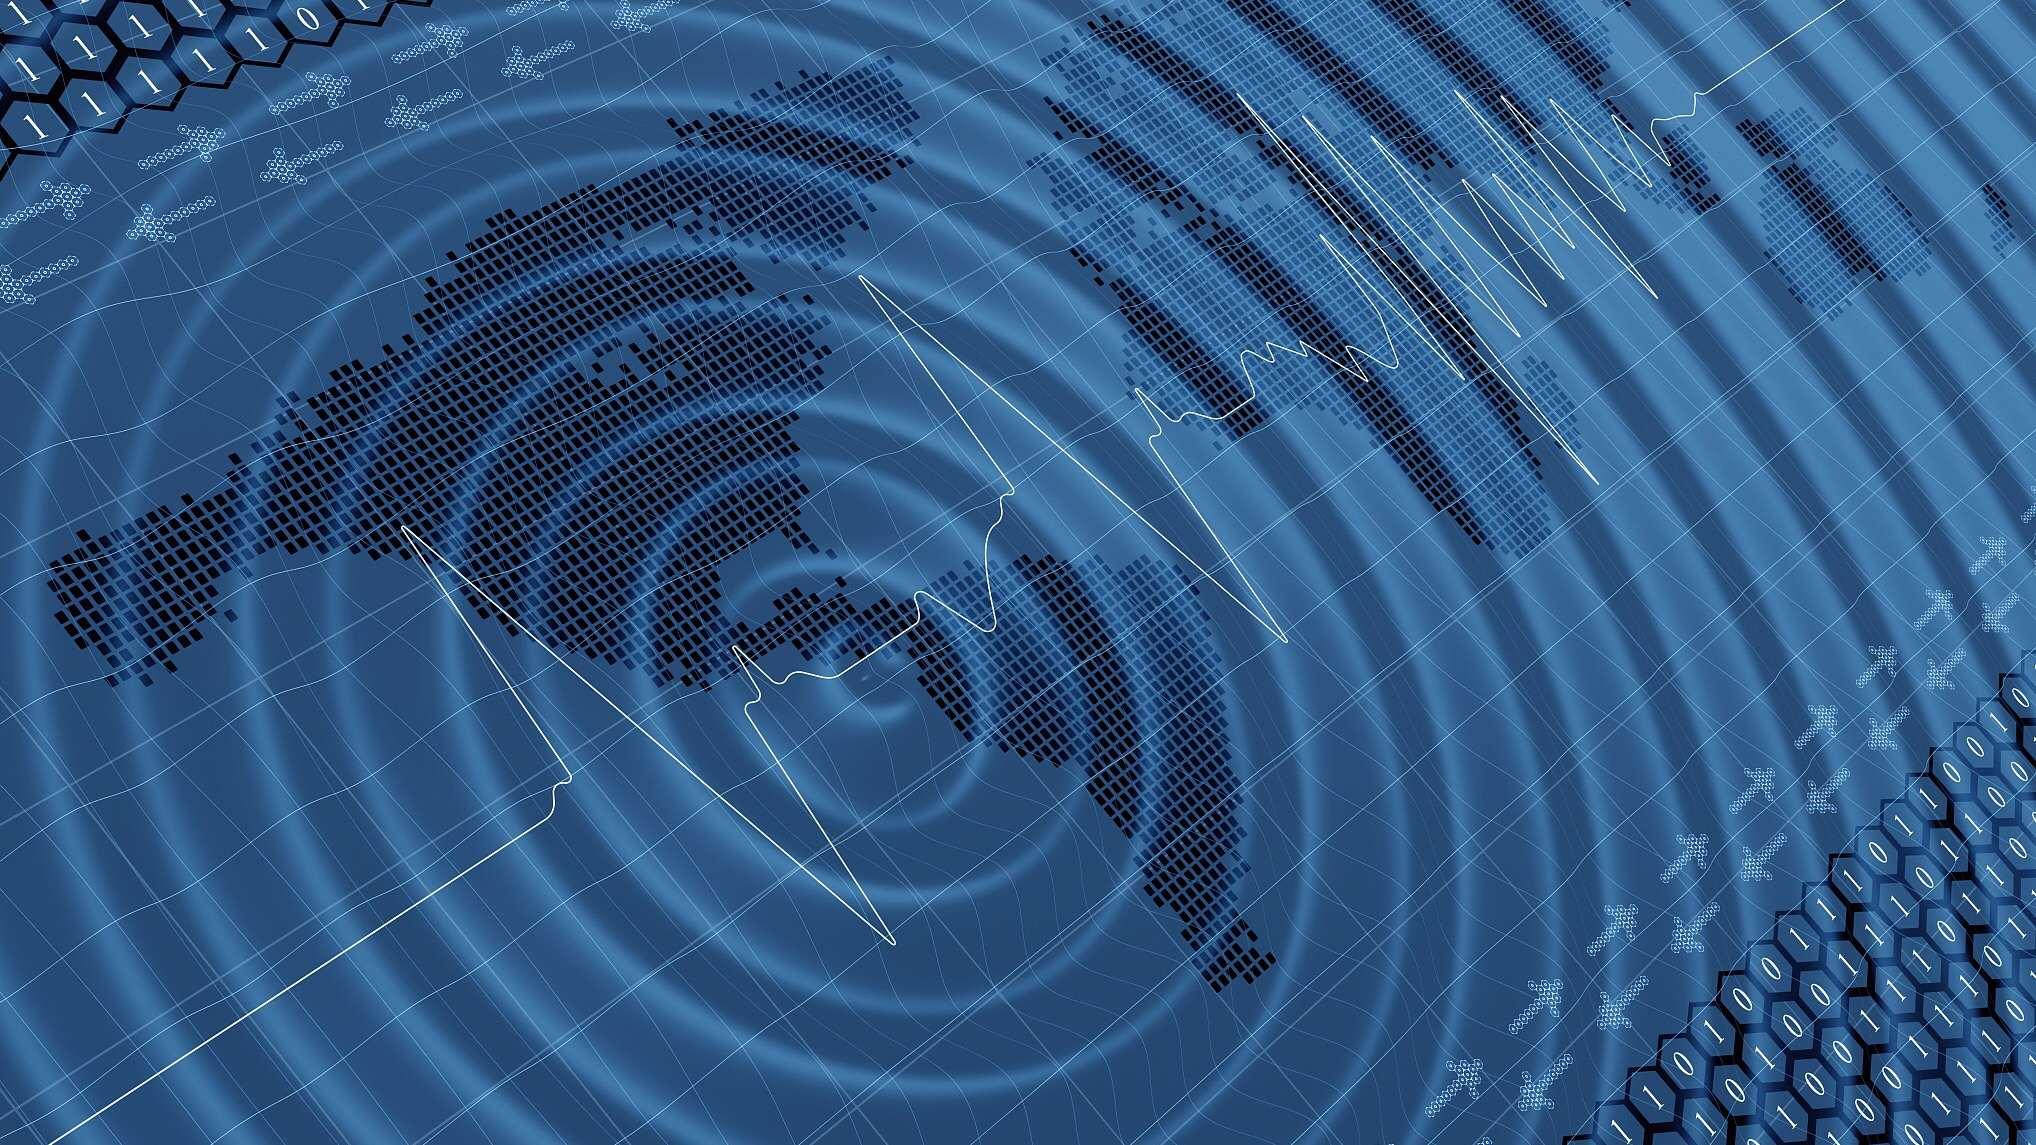 6.9-magnitude quake hits Pawican, Philippines: USGS